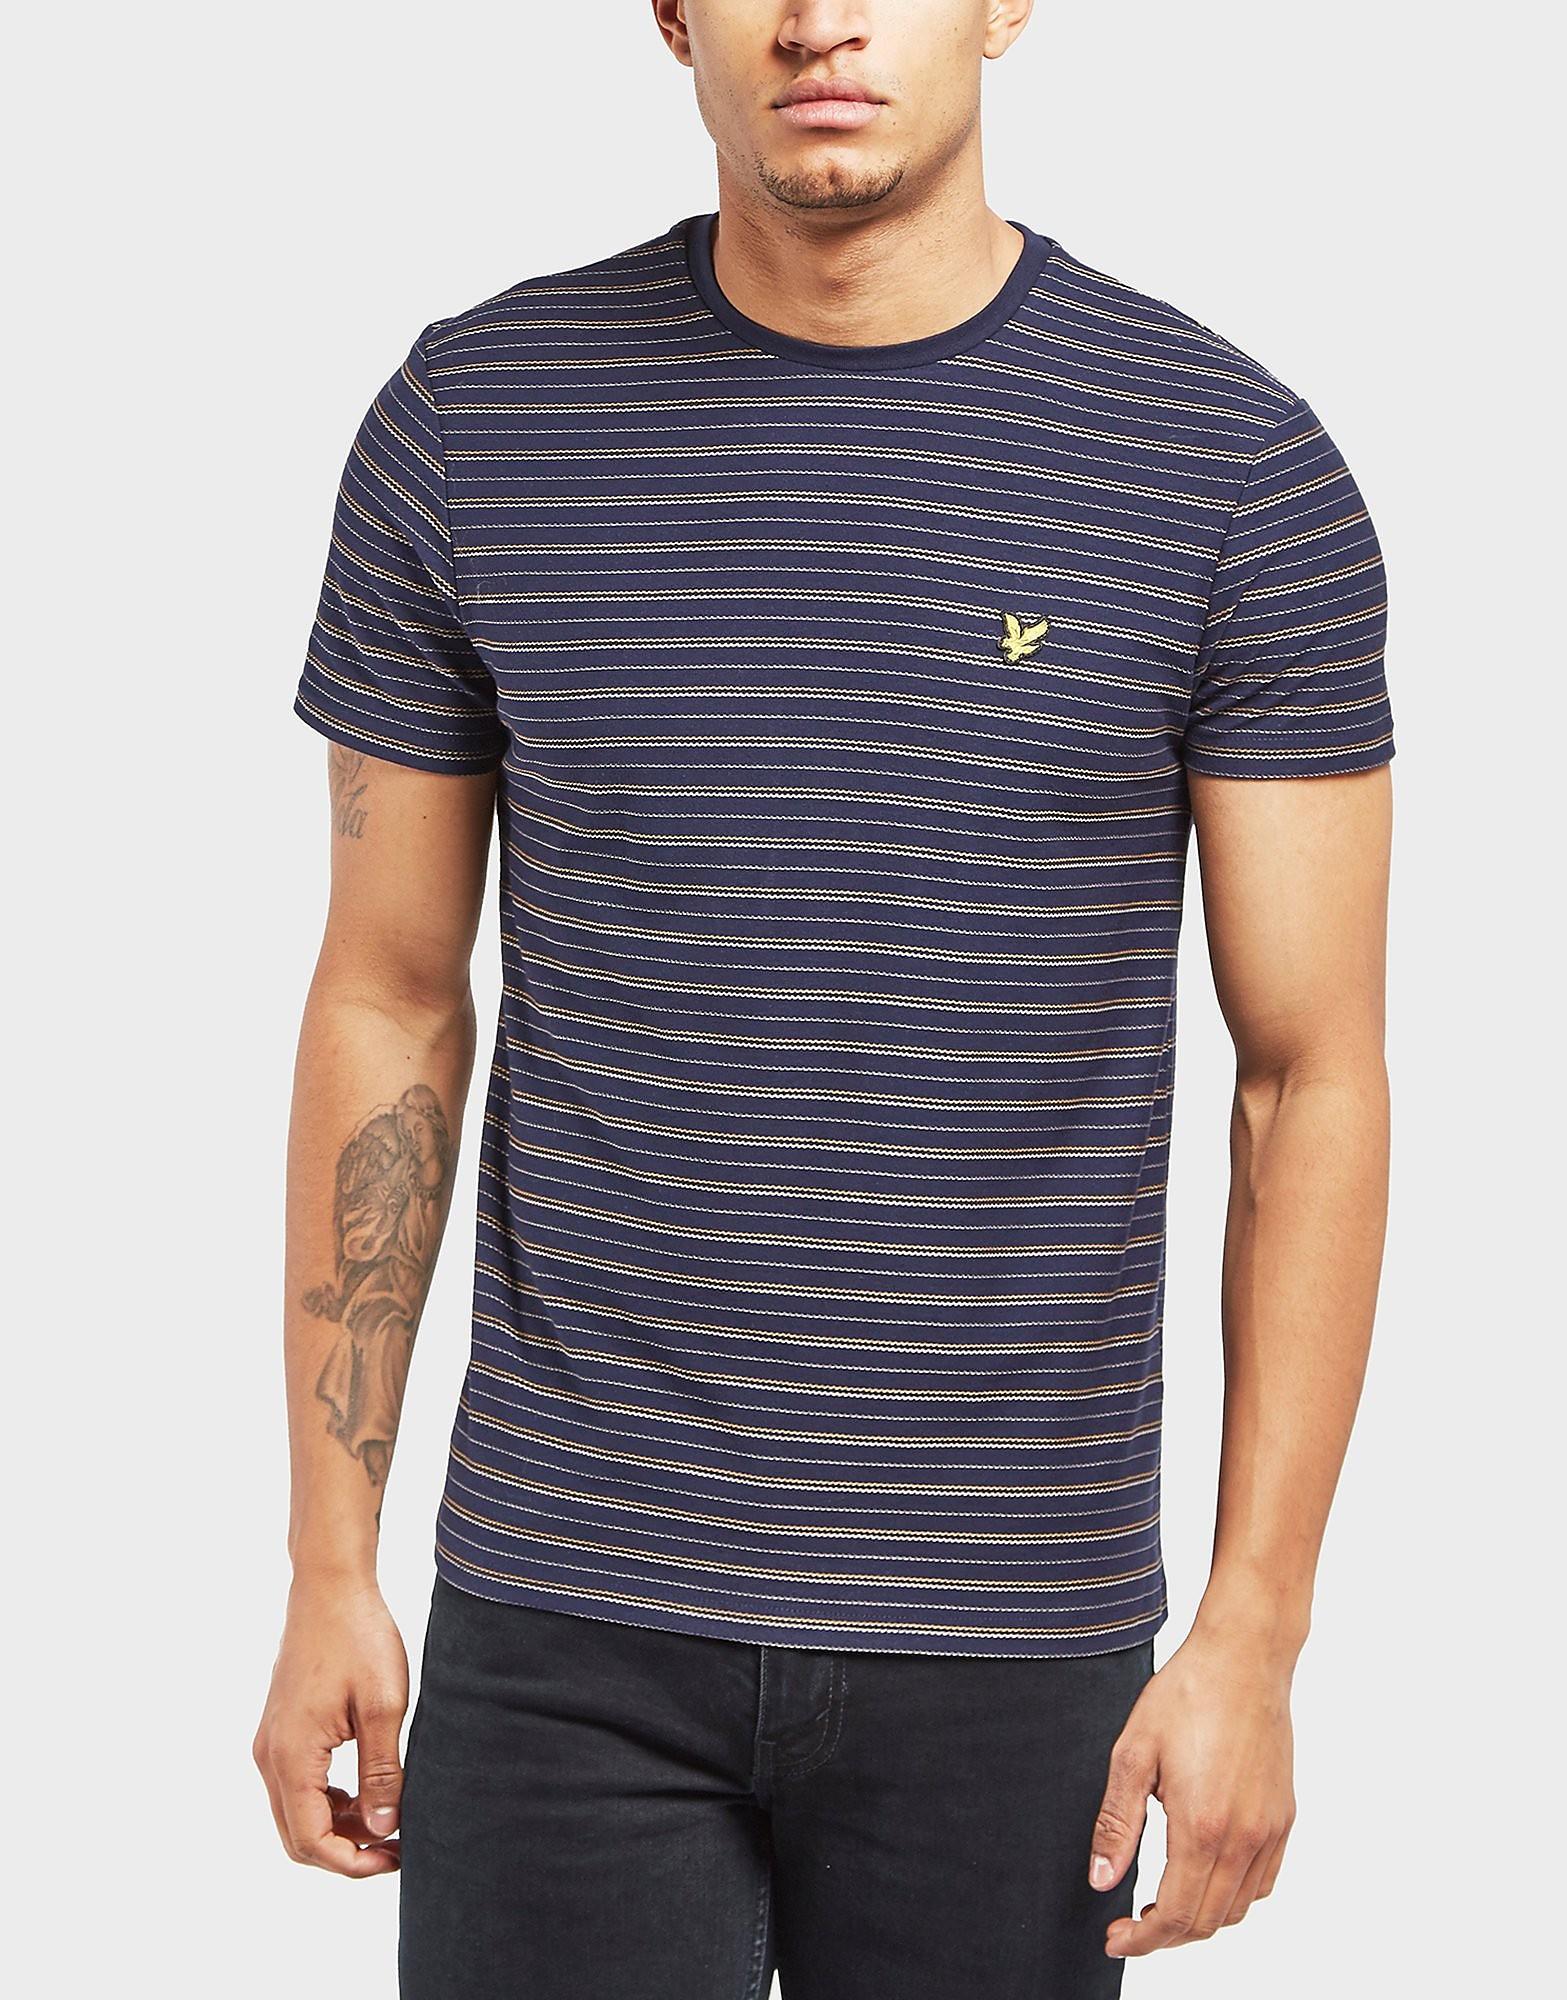 Lyle & Scott Bungee Stripe Short Sleeve T-Shirt